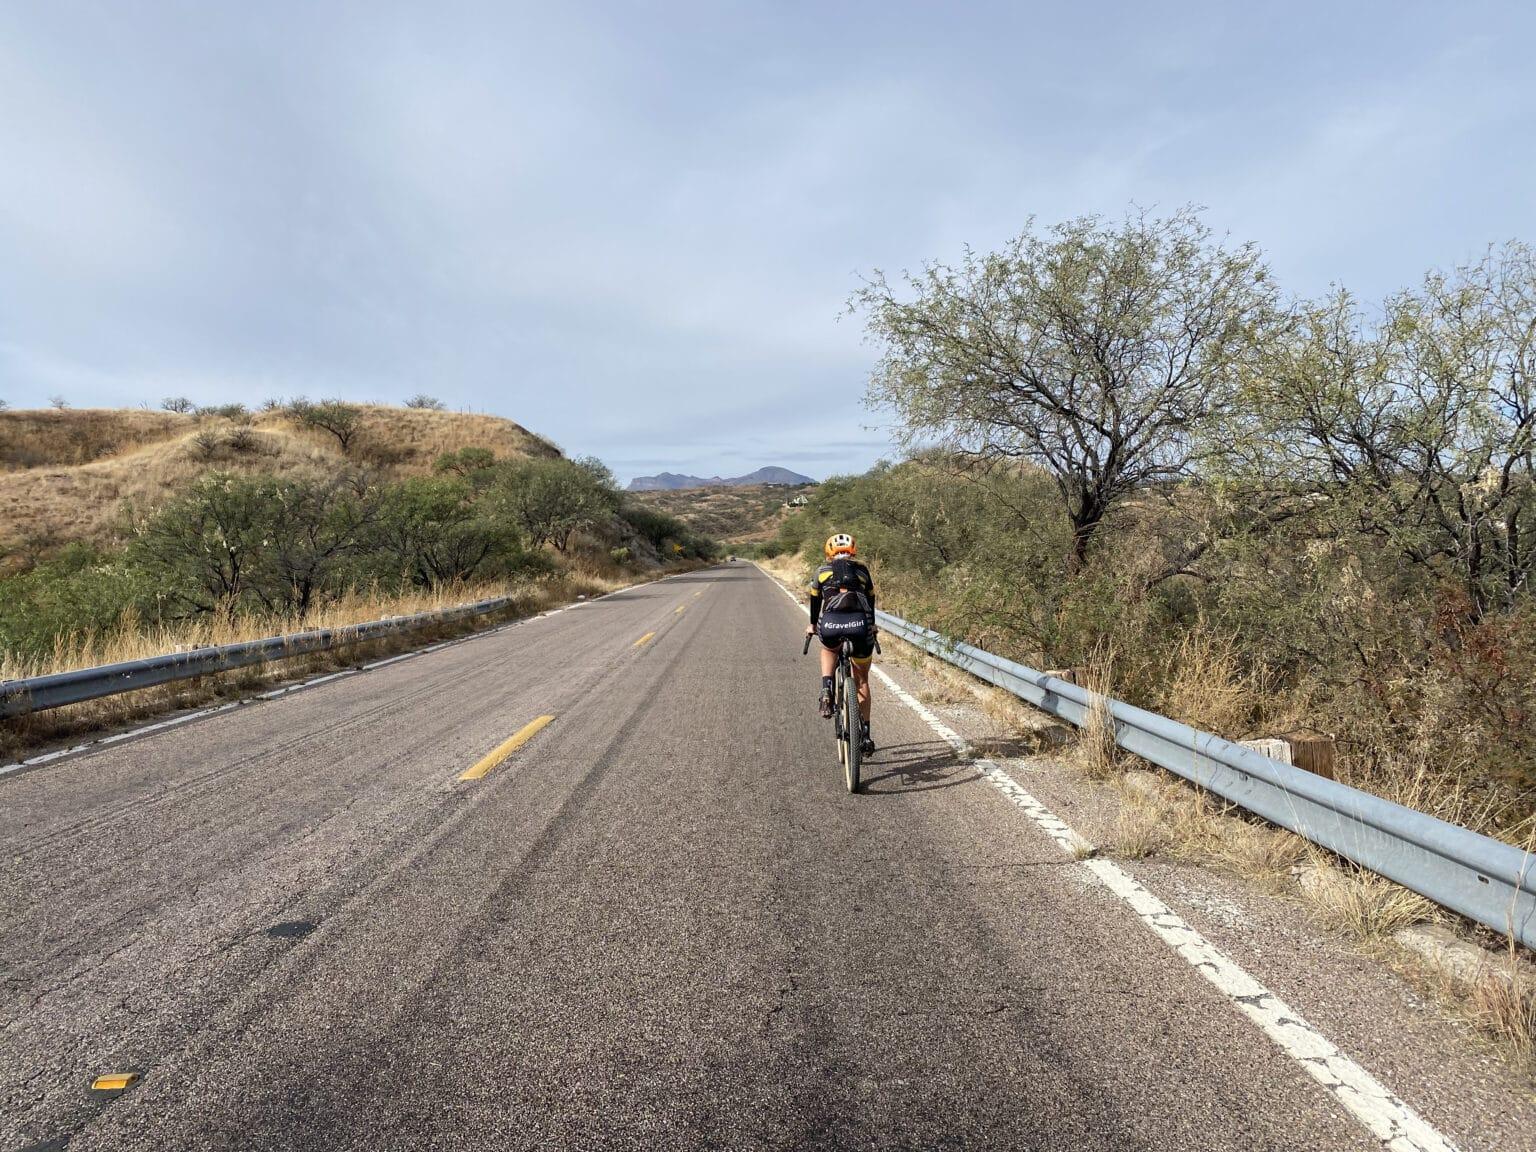 Uphill gravel road near the Mexico border in Arizona.